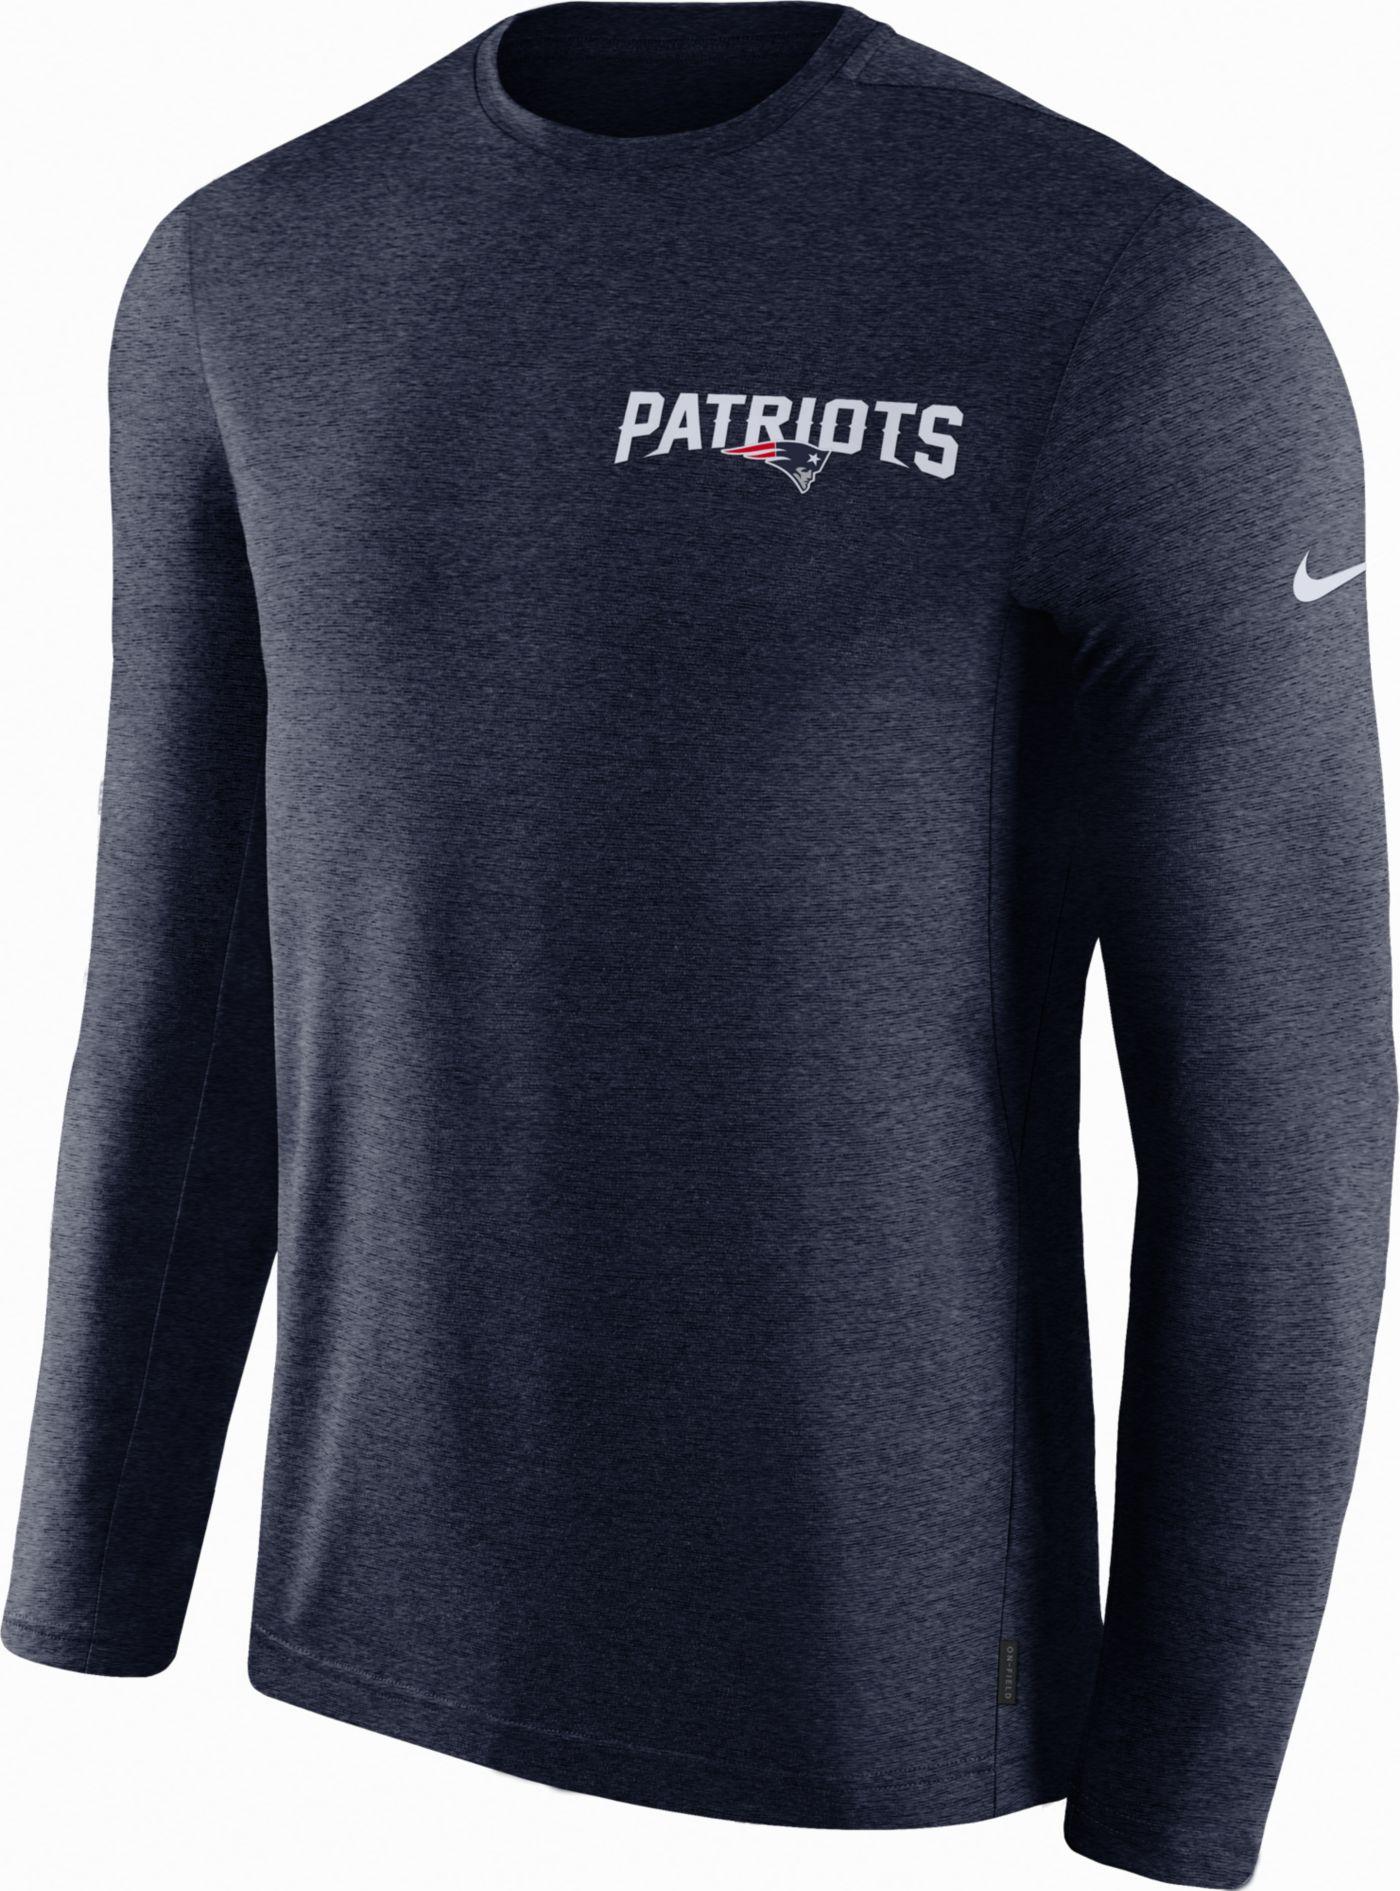 Nike Men's New England Patriots Sideline Coach Performance Navy Long Sleeve Shirt